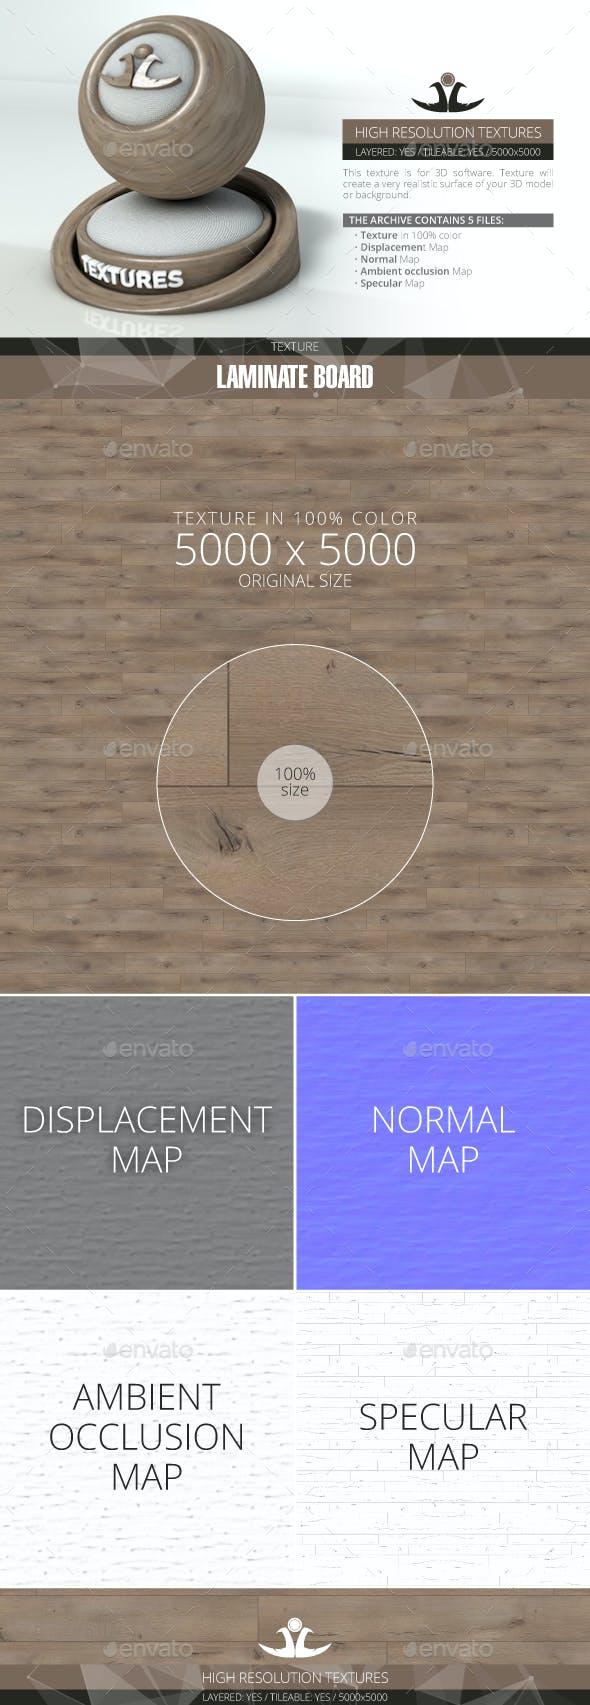 Laminate Board 69 - 3DOcean Item for Sale